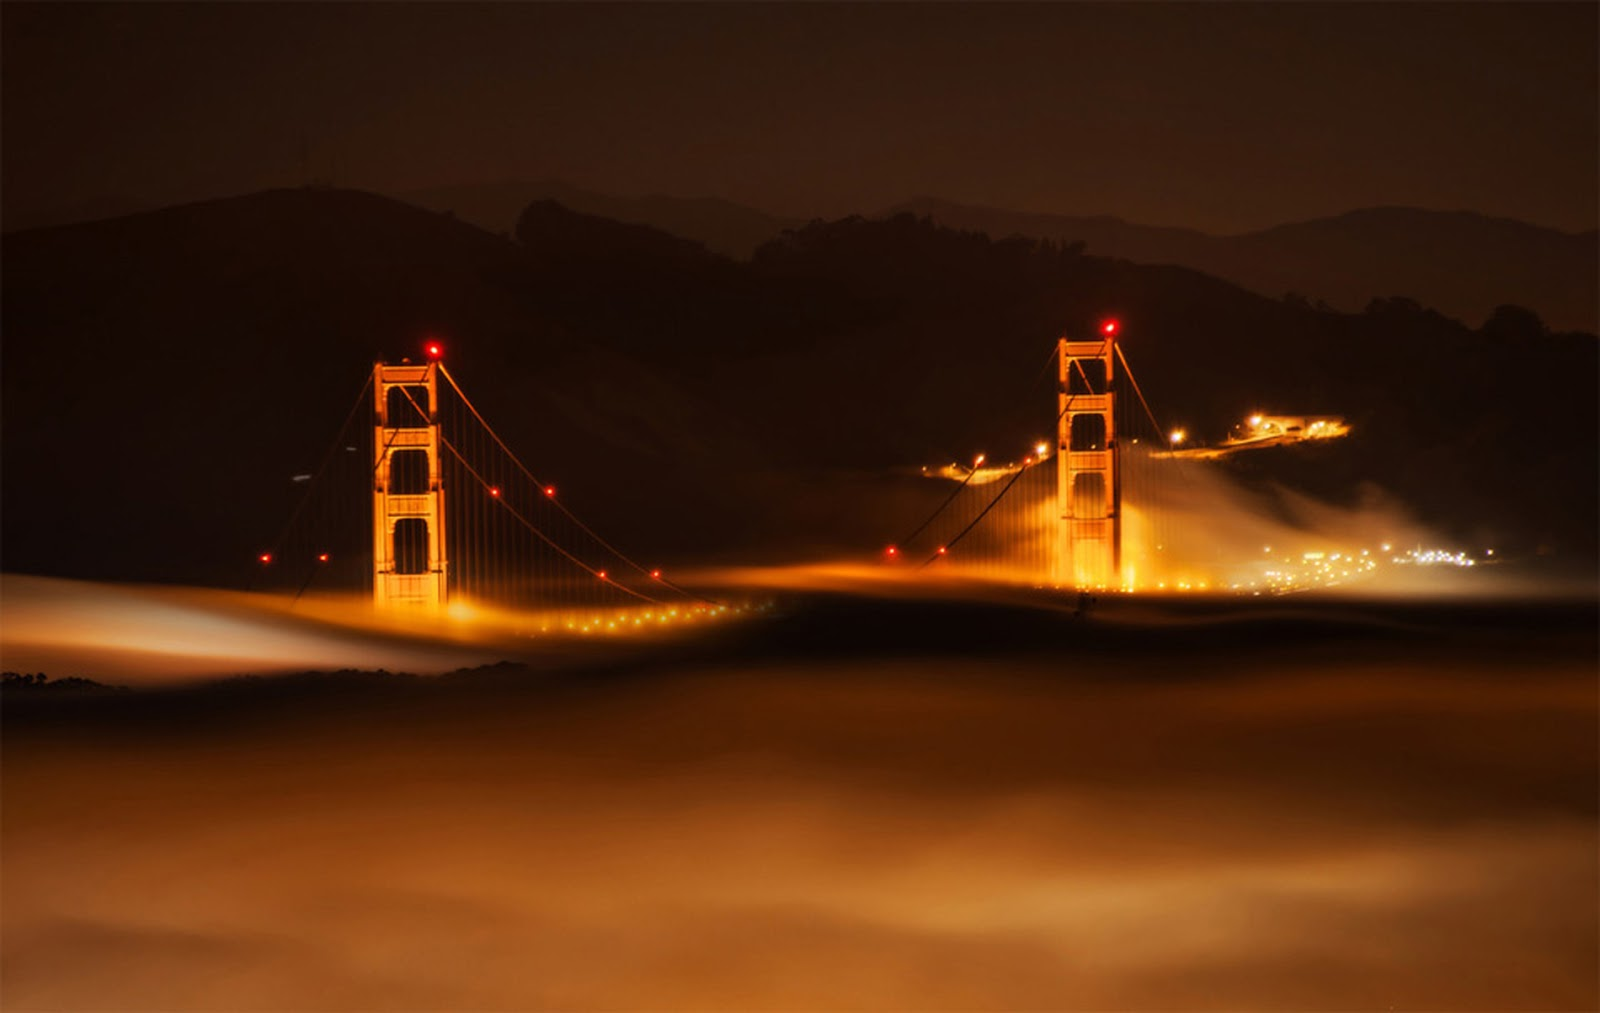 San Francisco HD Wallpaper HD Wallpaper Fog HD Wallpaper 1600x1013